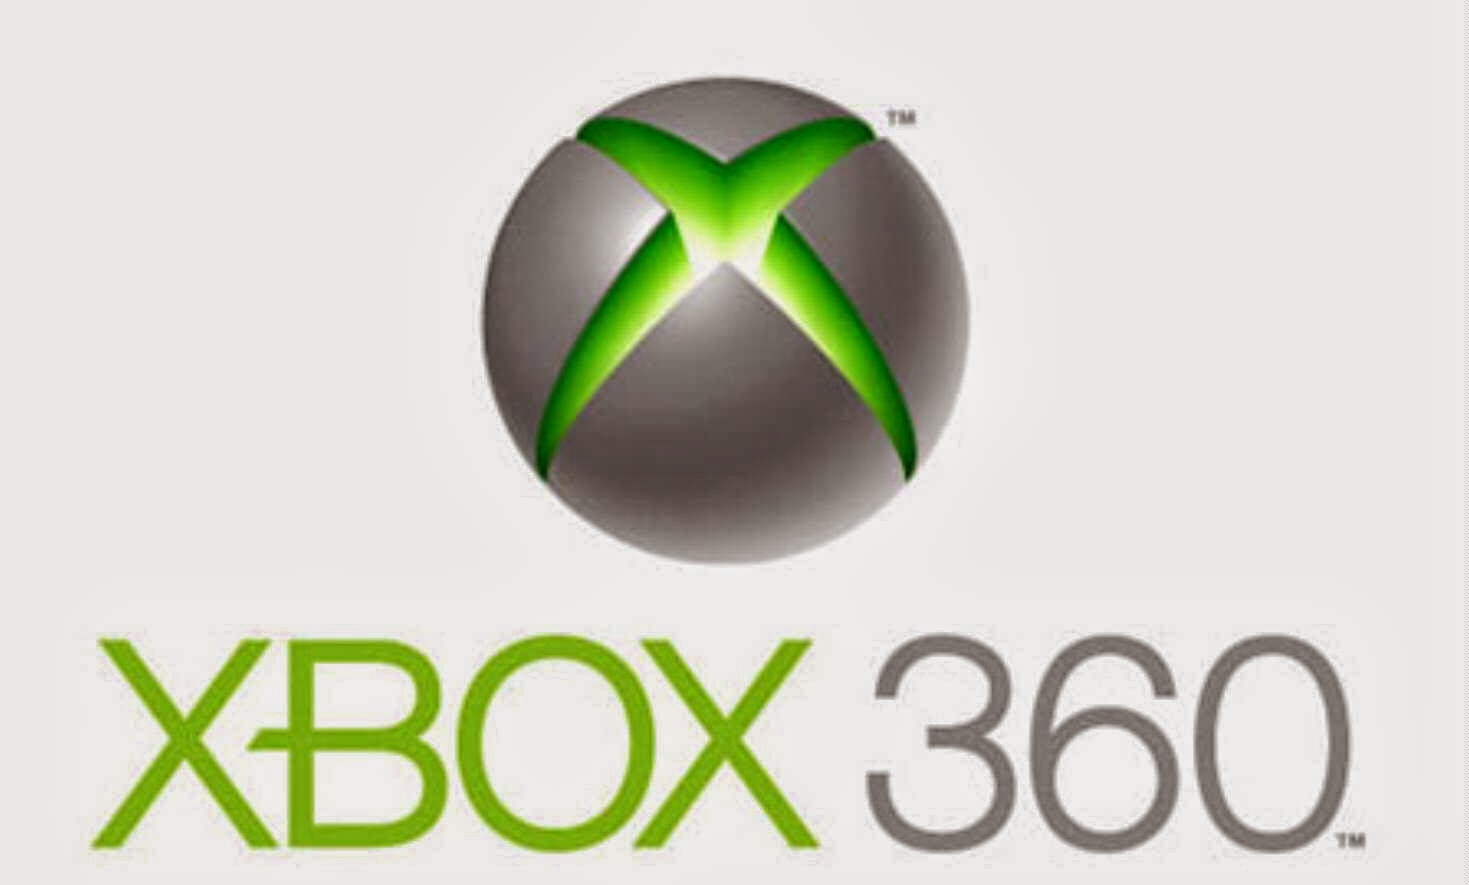 GTA 5 For PC emulator: GTA 5 PC xbox 360 emulator [working]